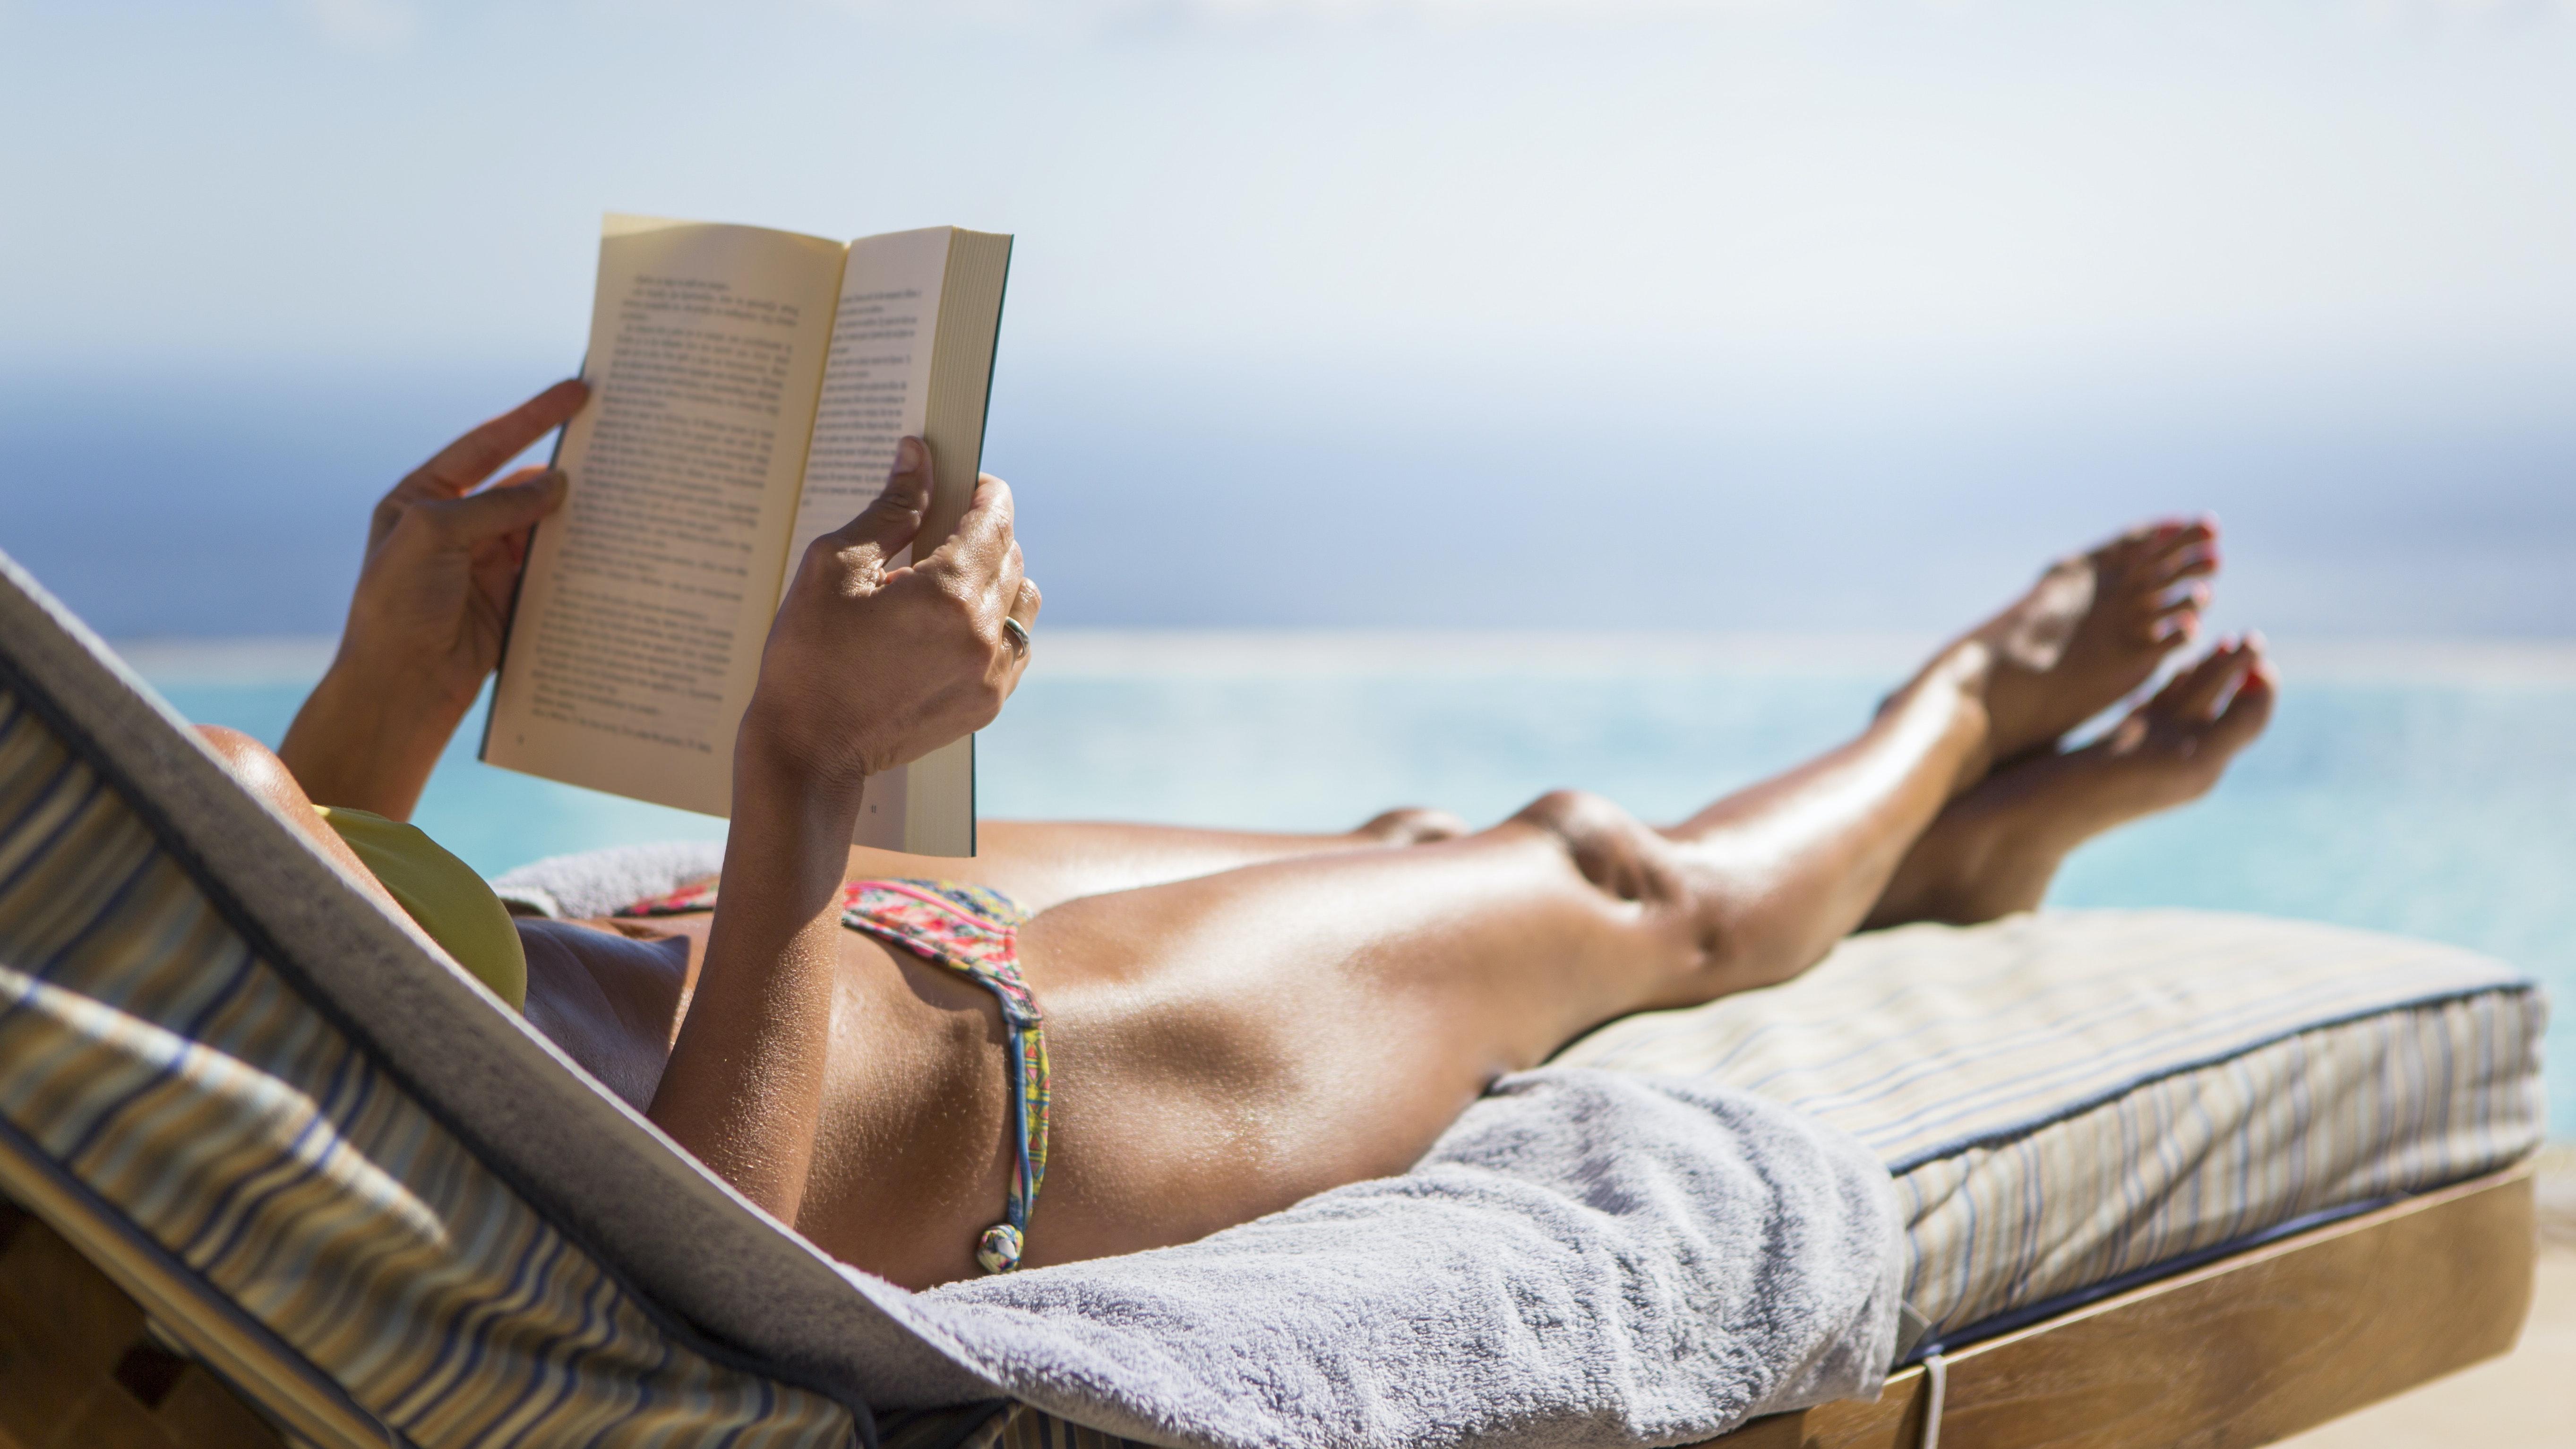 woman on beach sunscreen spf sun protective clothing